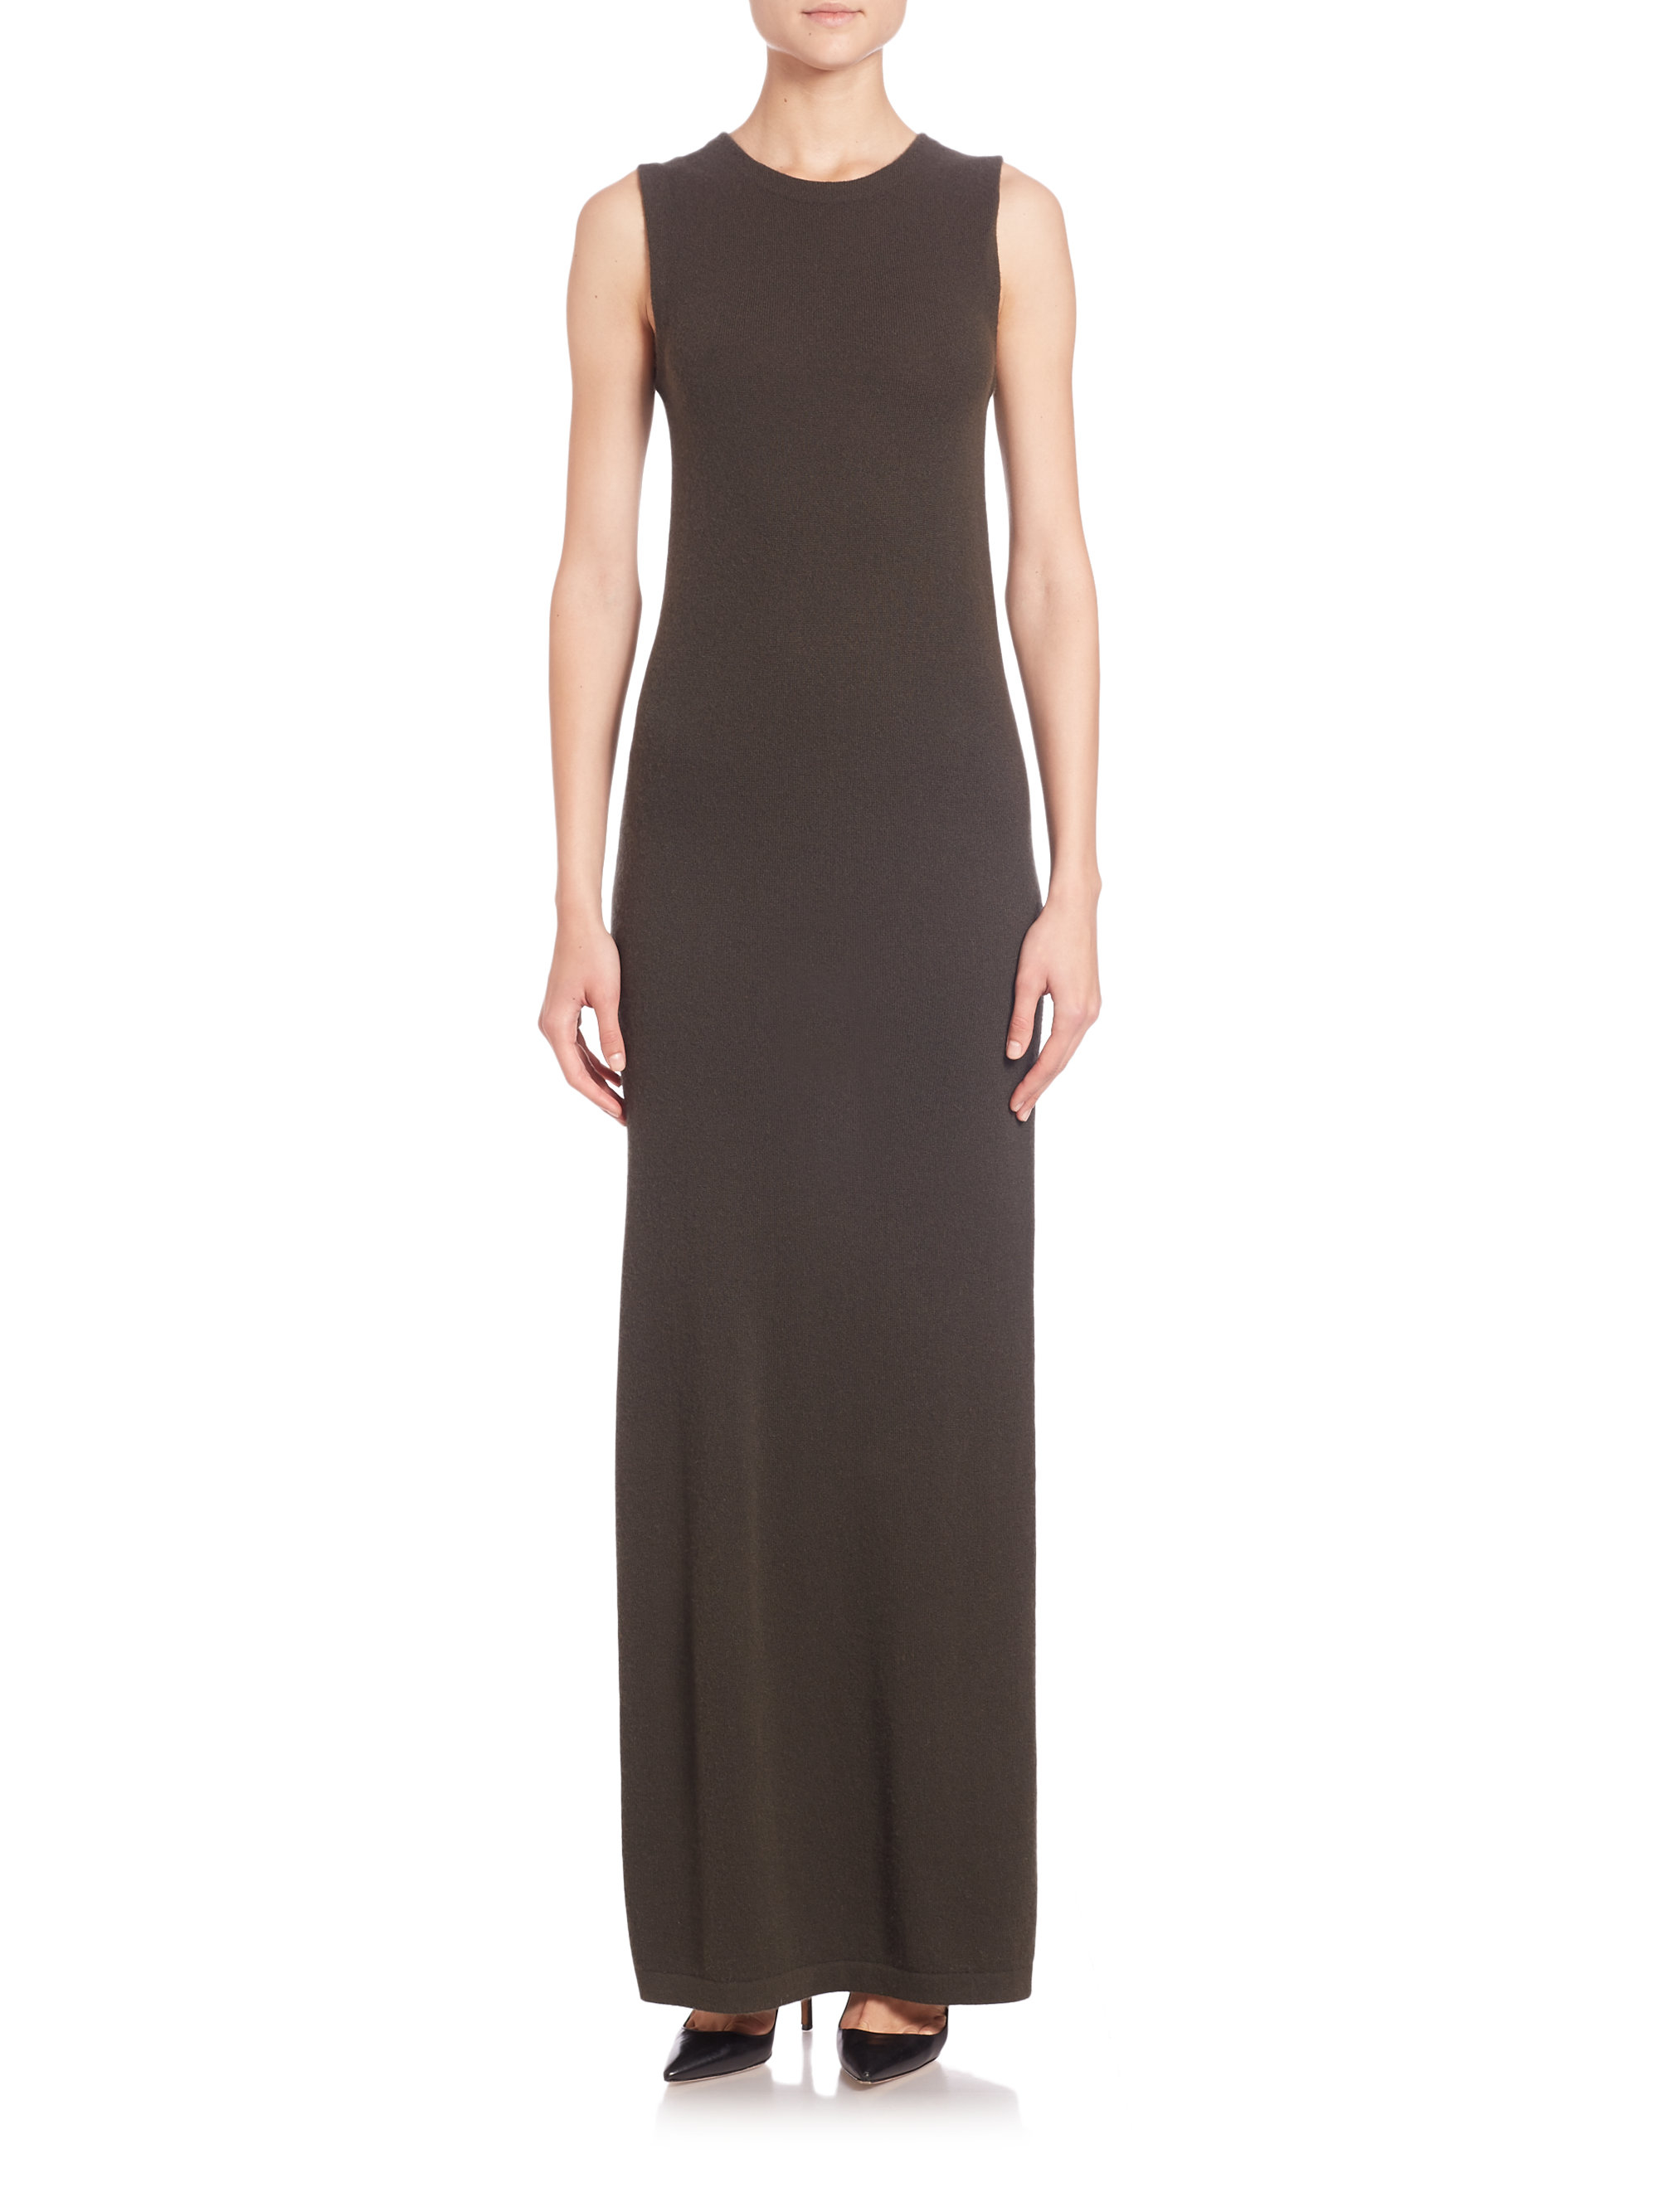 Theory Dorada Cashmere Sleeveless Maxi Dress in Black | Lyst